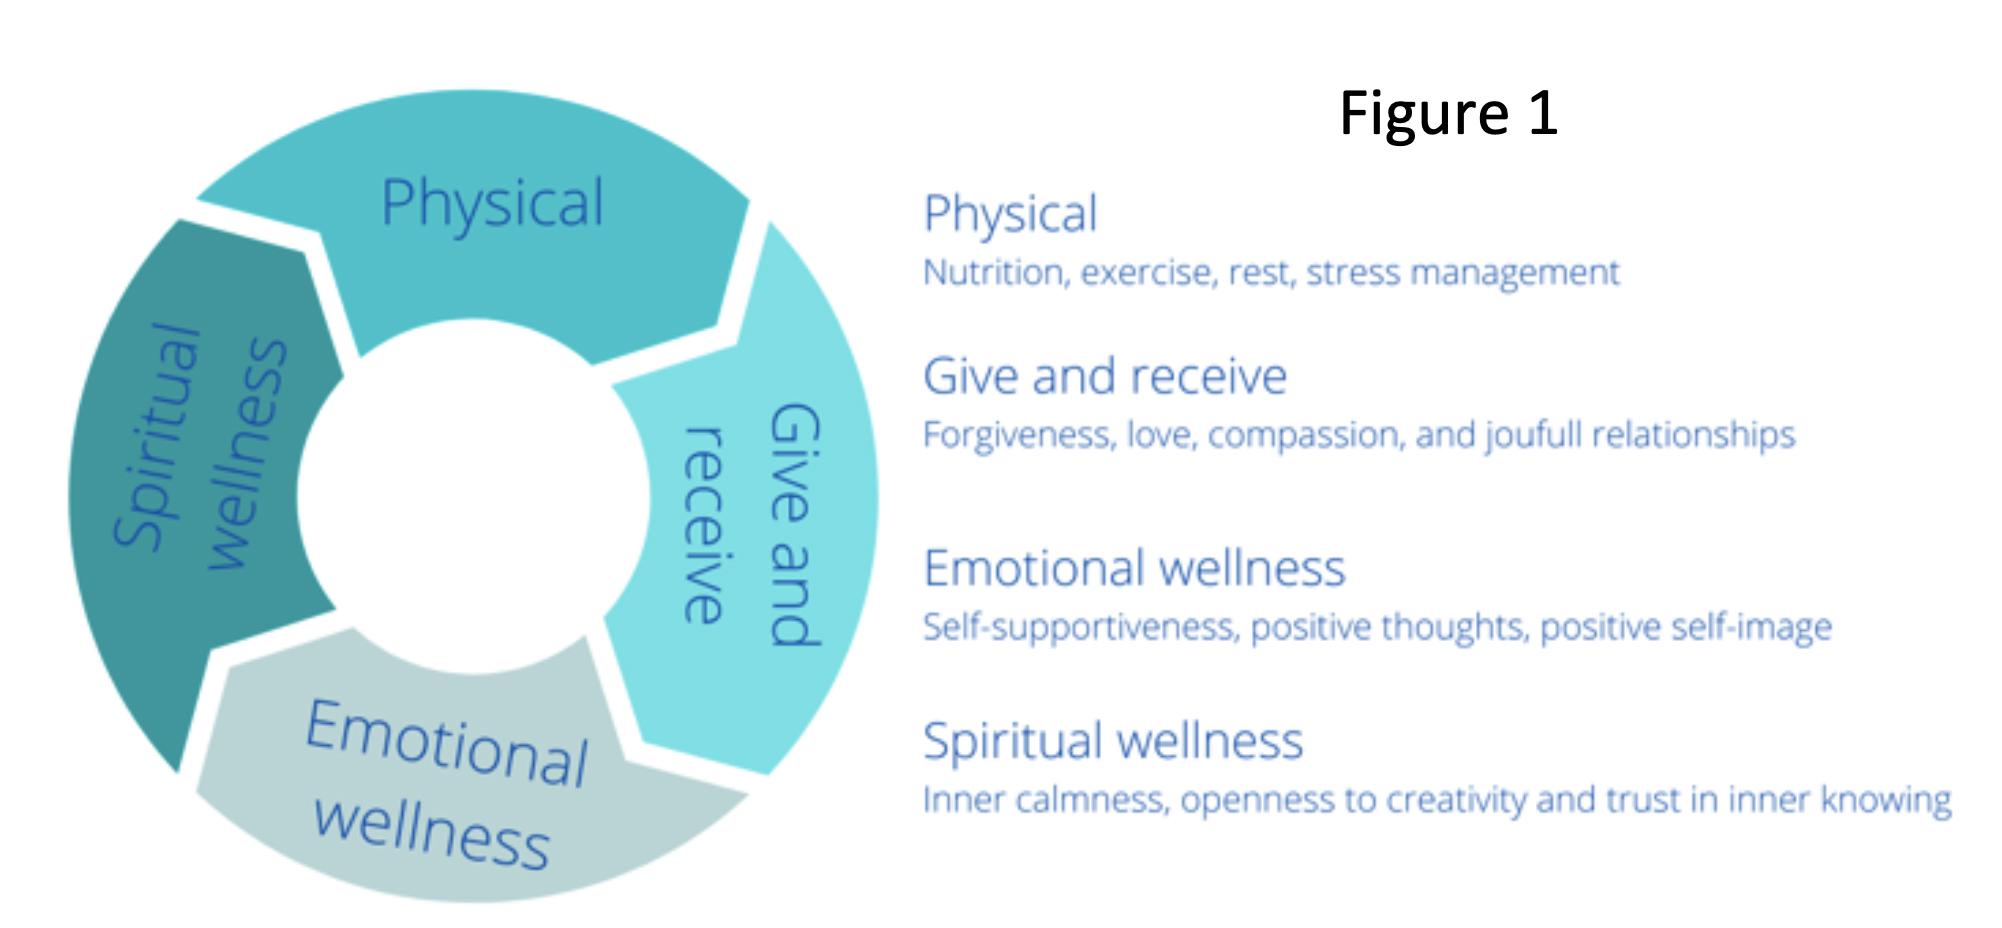 Blog 5 | Nicolien | Play – reflect – grow